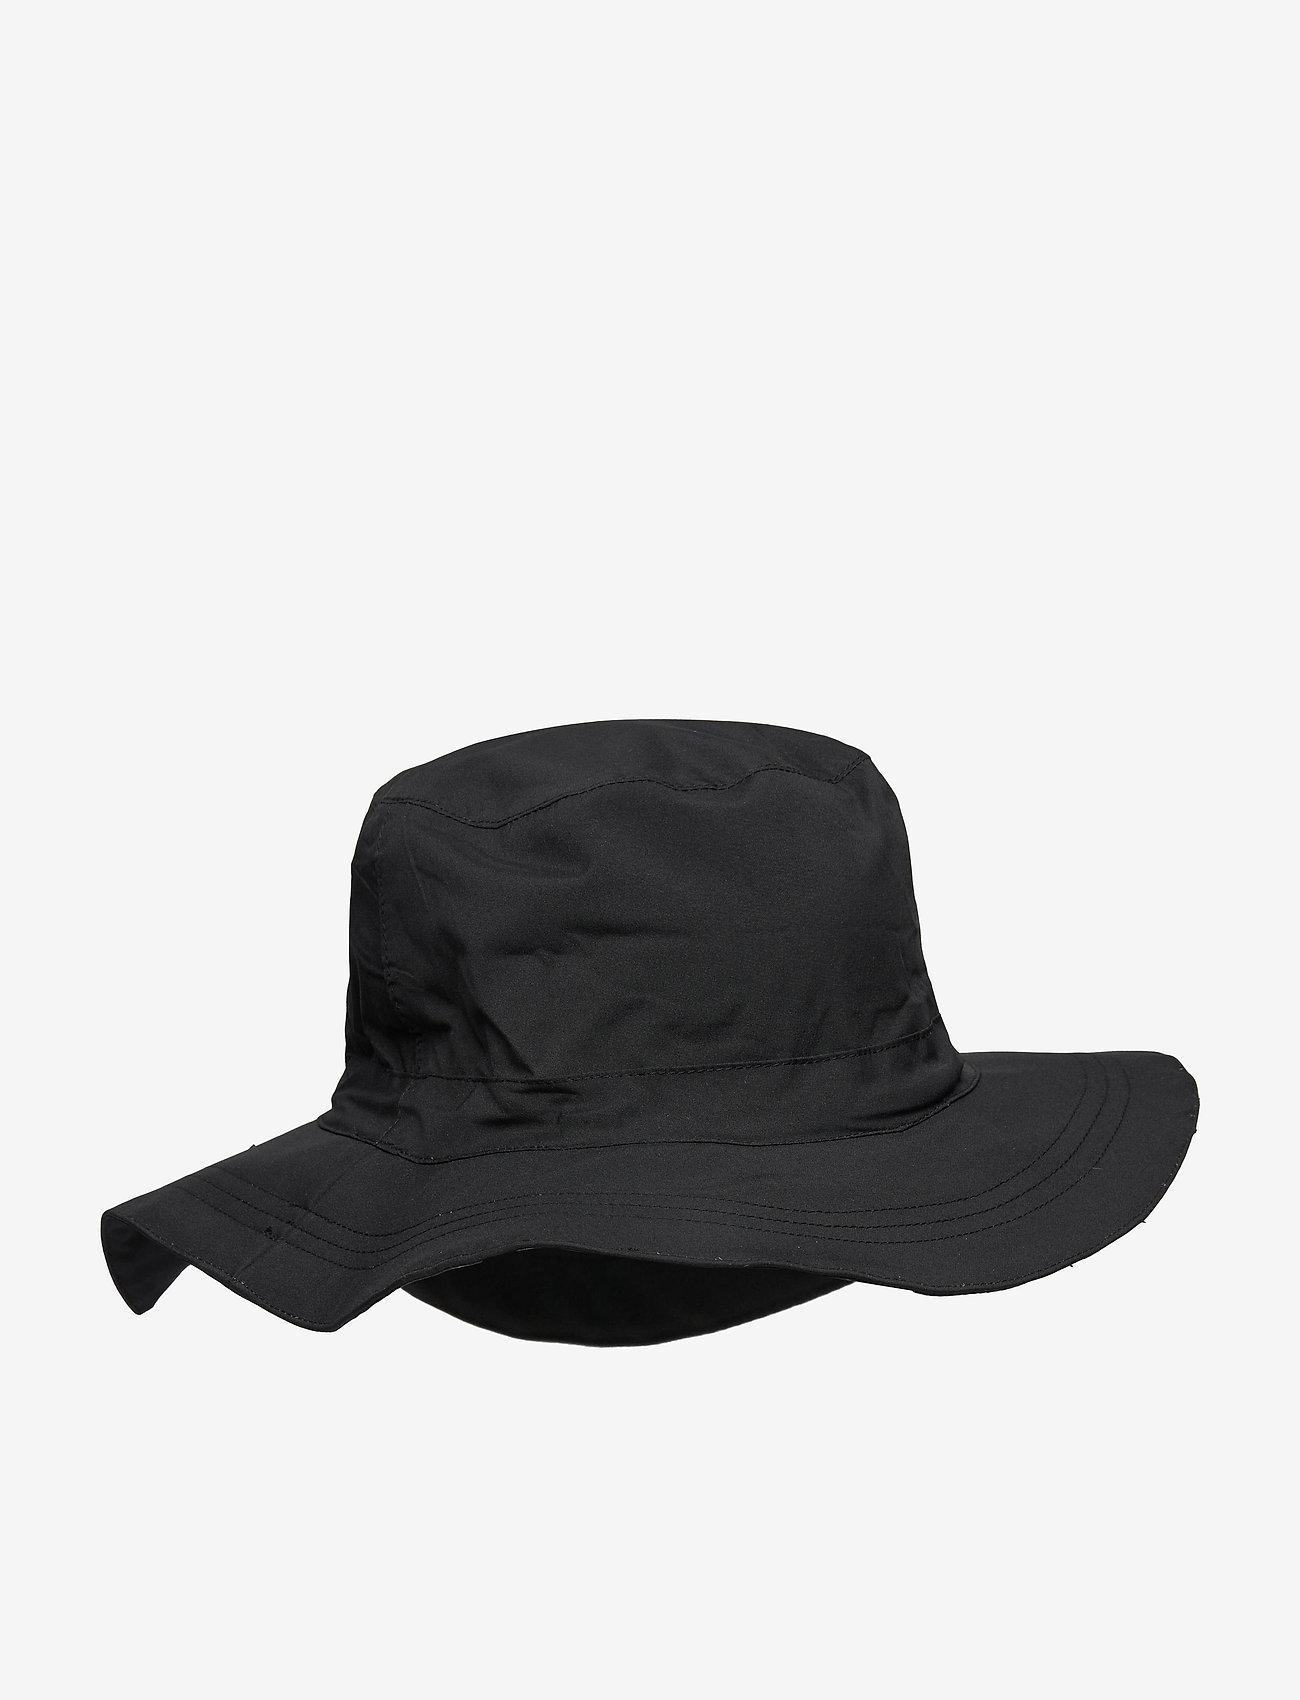 Abacus - Links rainhat - bucket hats - black - 0